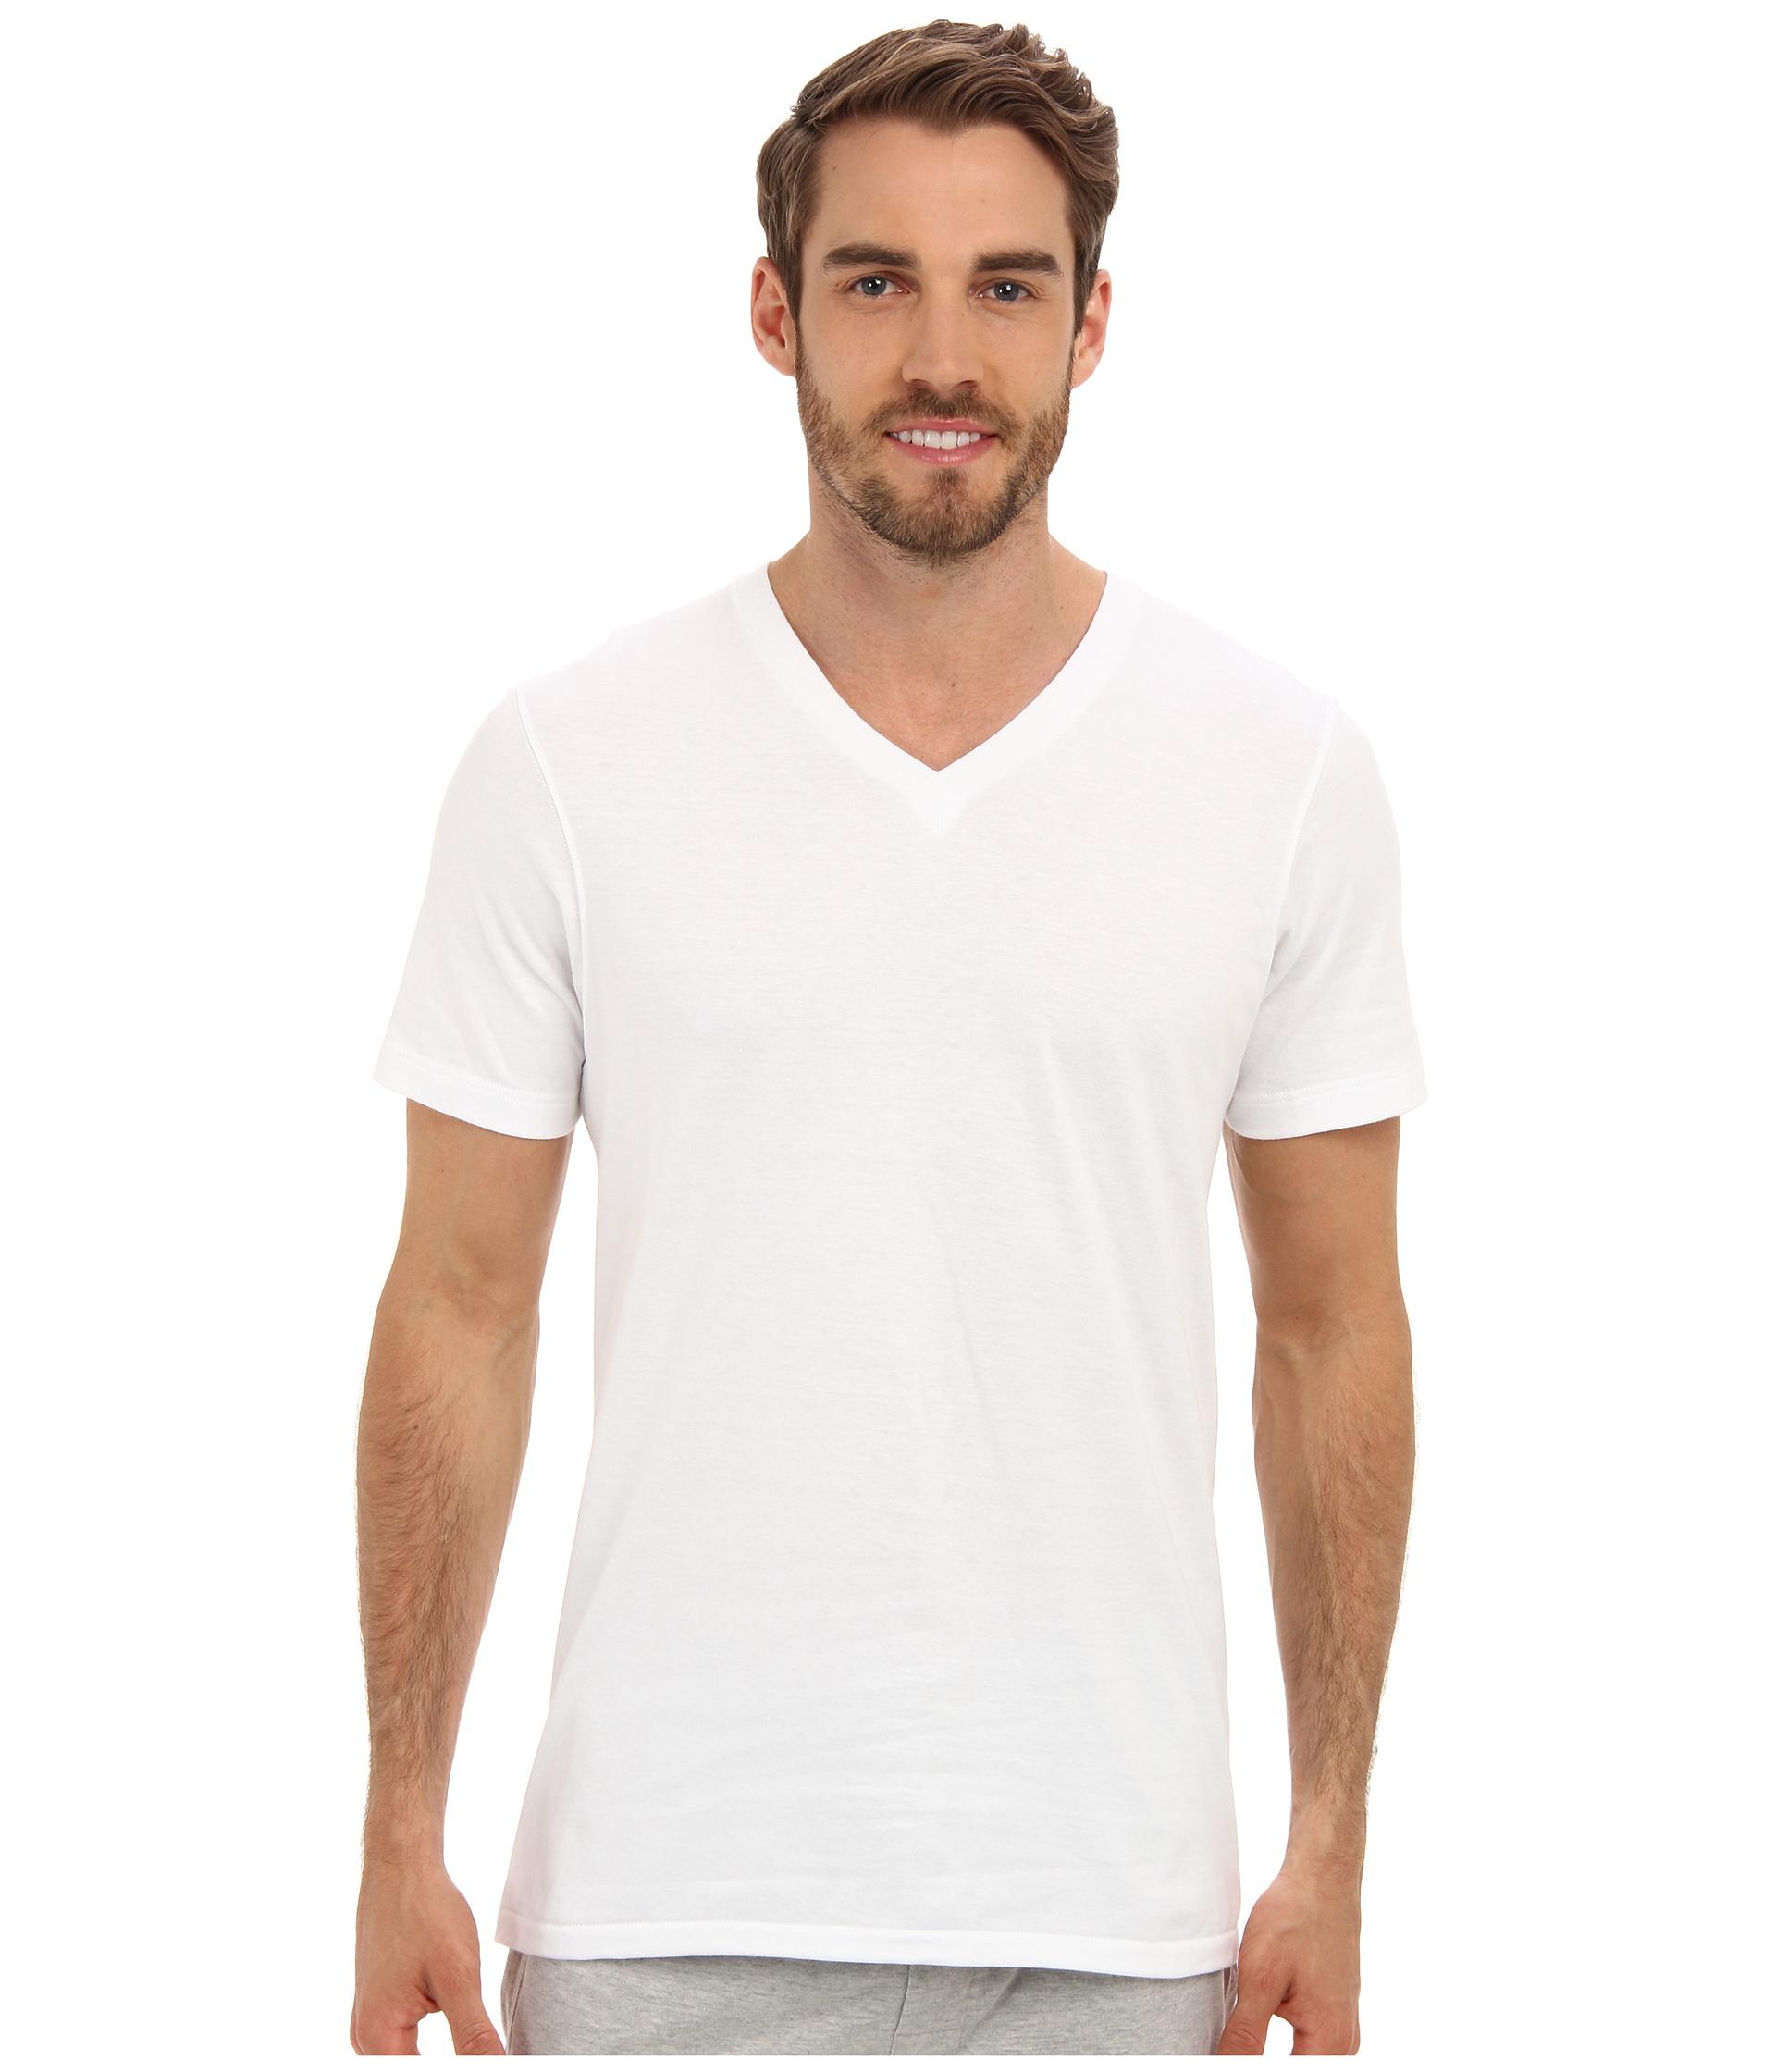 Jockey cotton v neck t shirt 3 pack at for Jockey v neck shirt